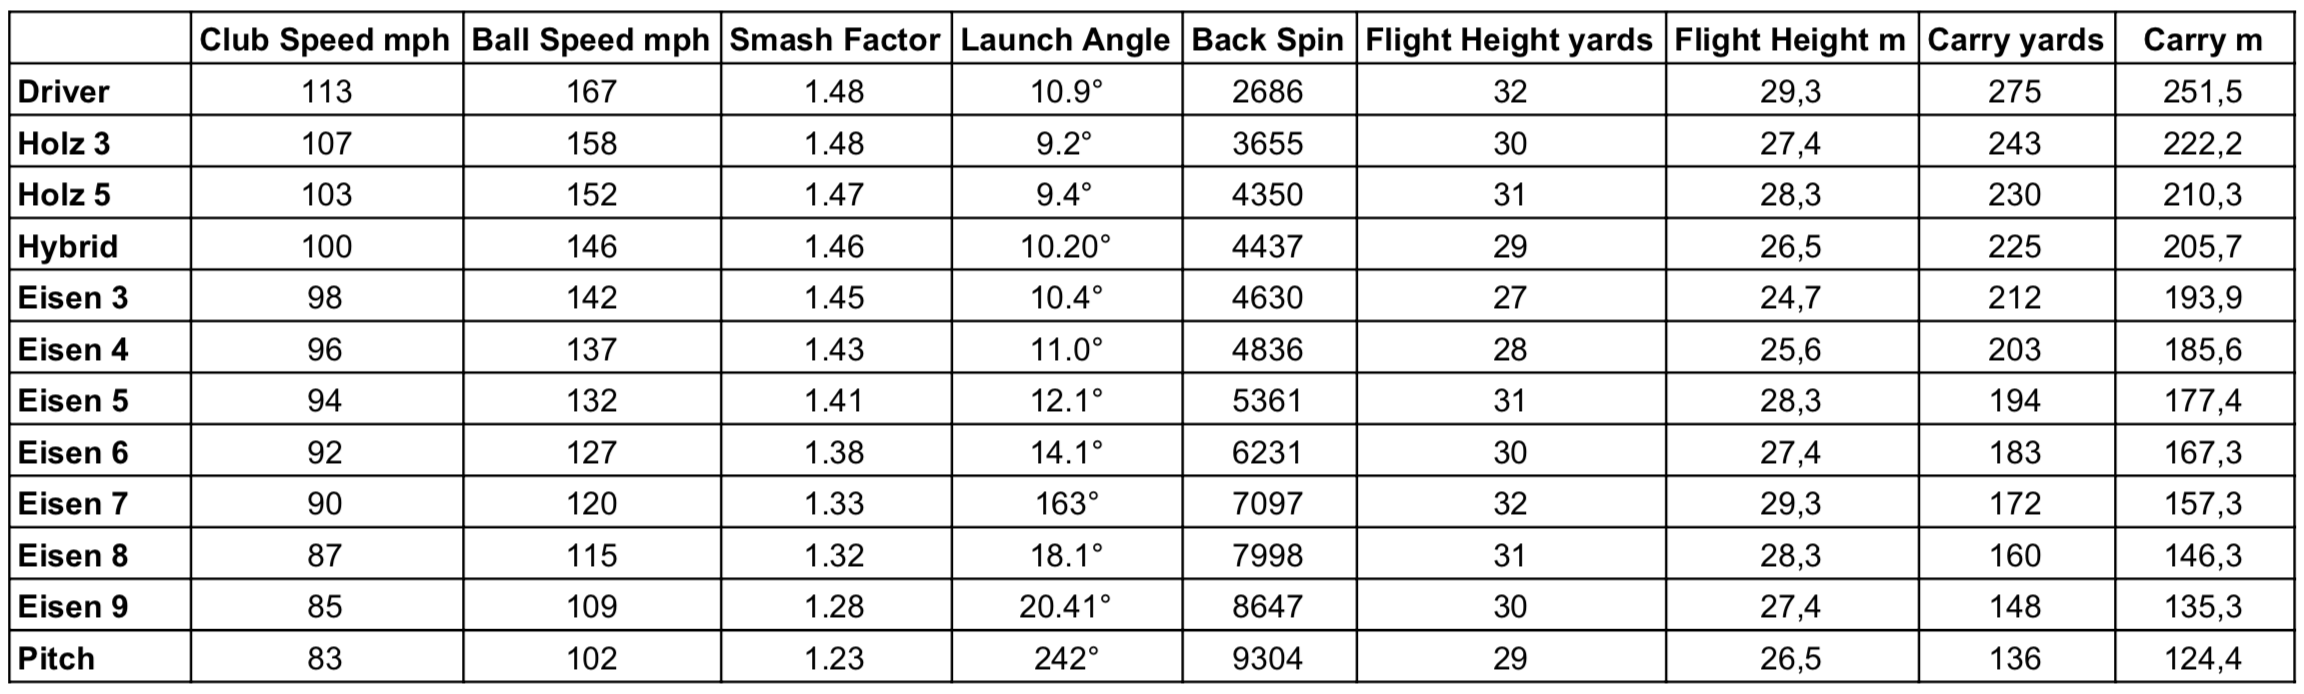 PGA-Tour Statistik TrackMan